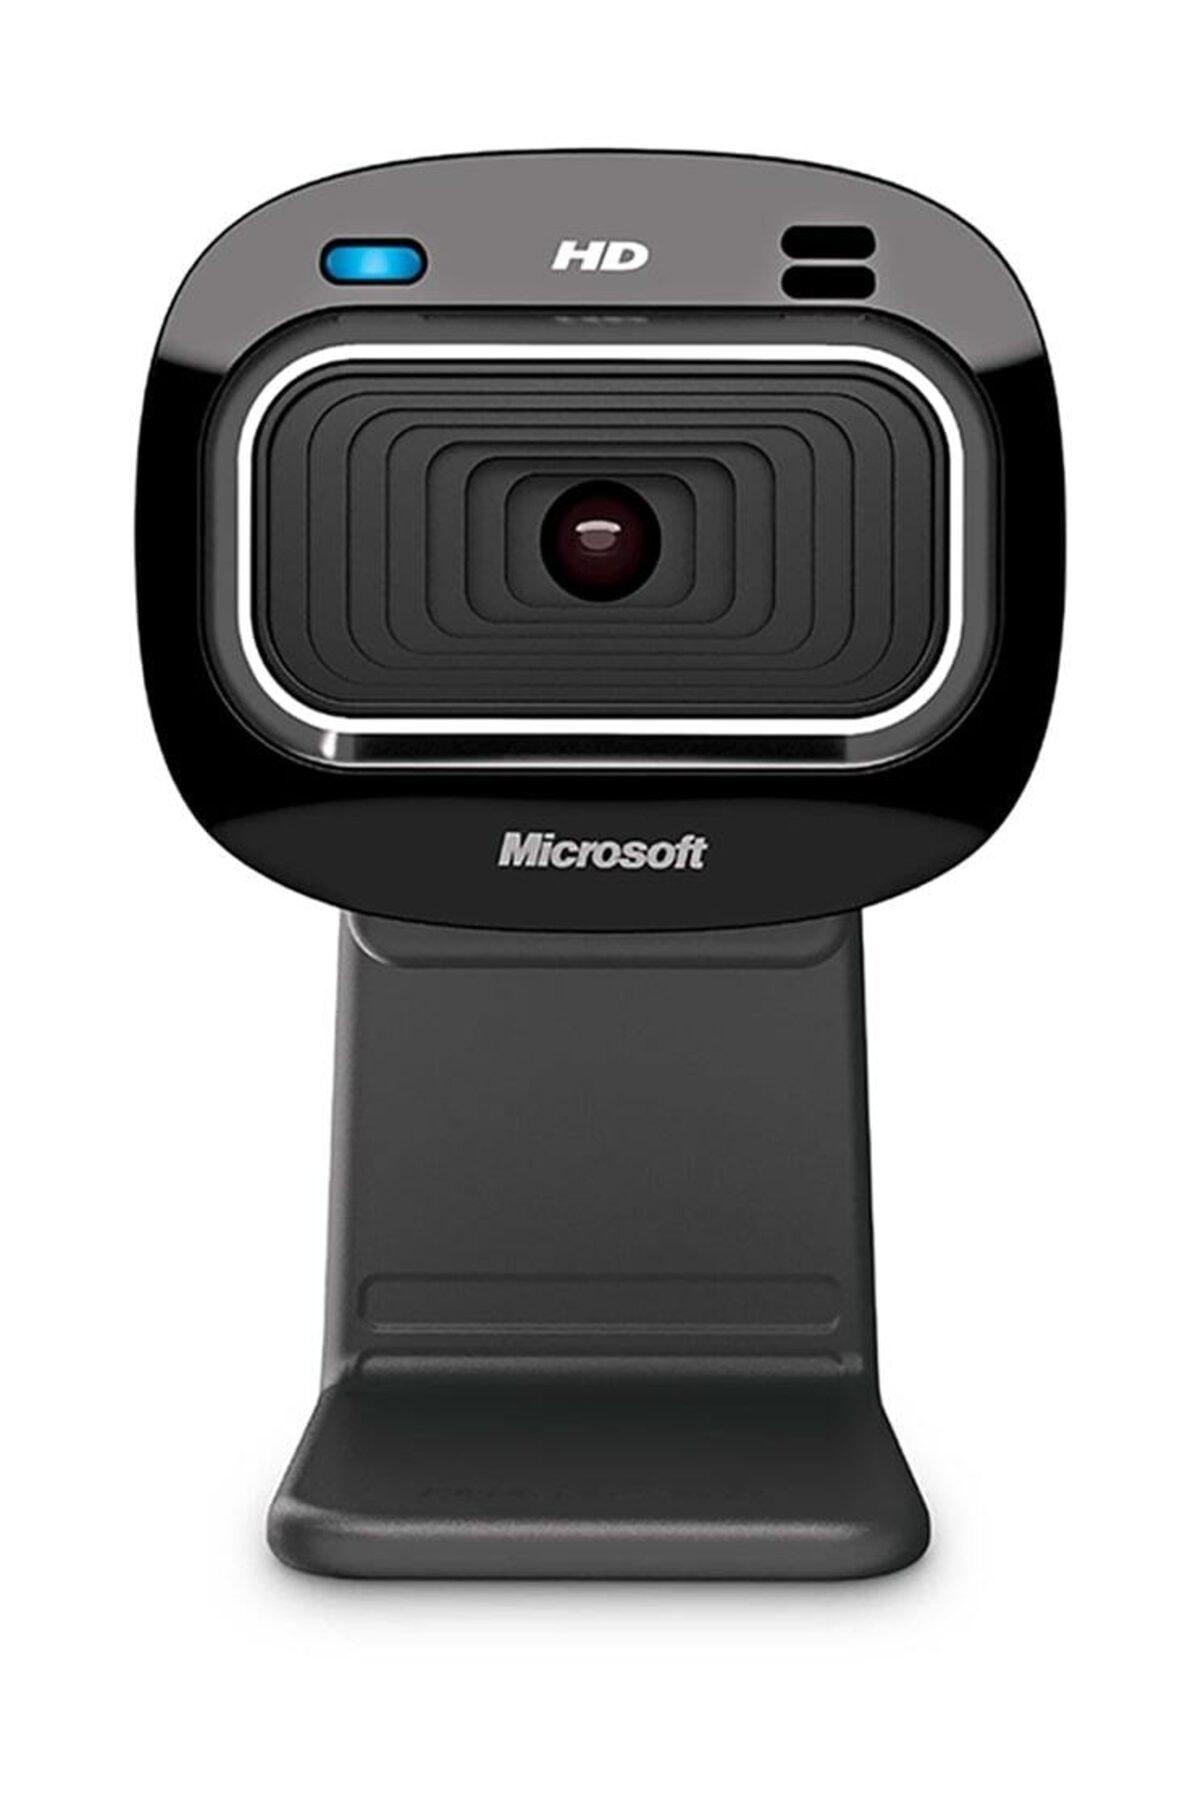 MICROSOFT Lifecam Hd-3000 720p Webcam (T4h-00004) 2